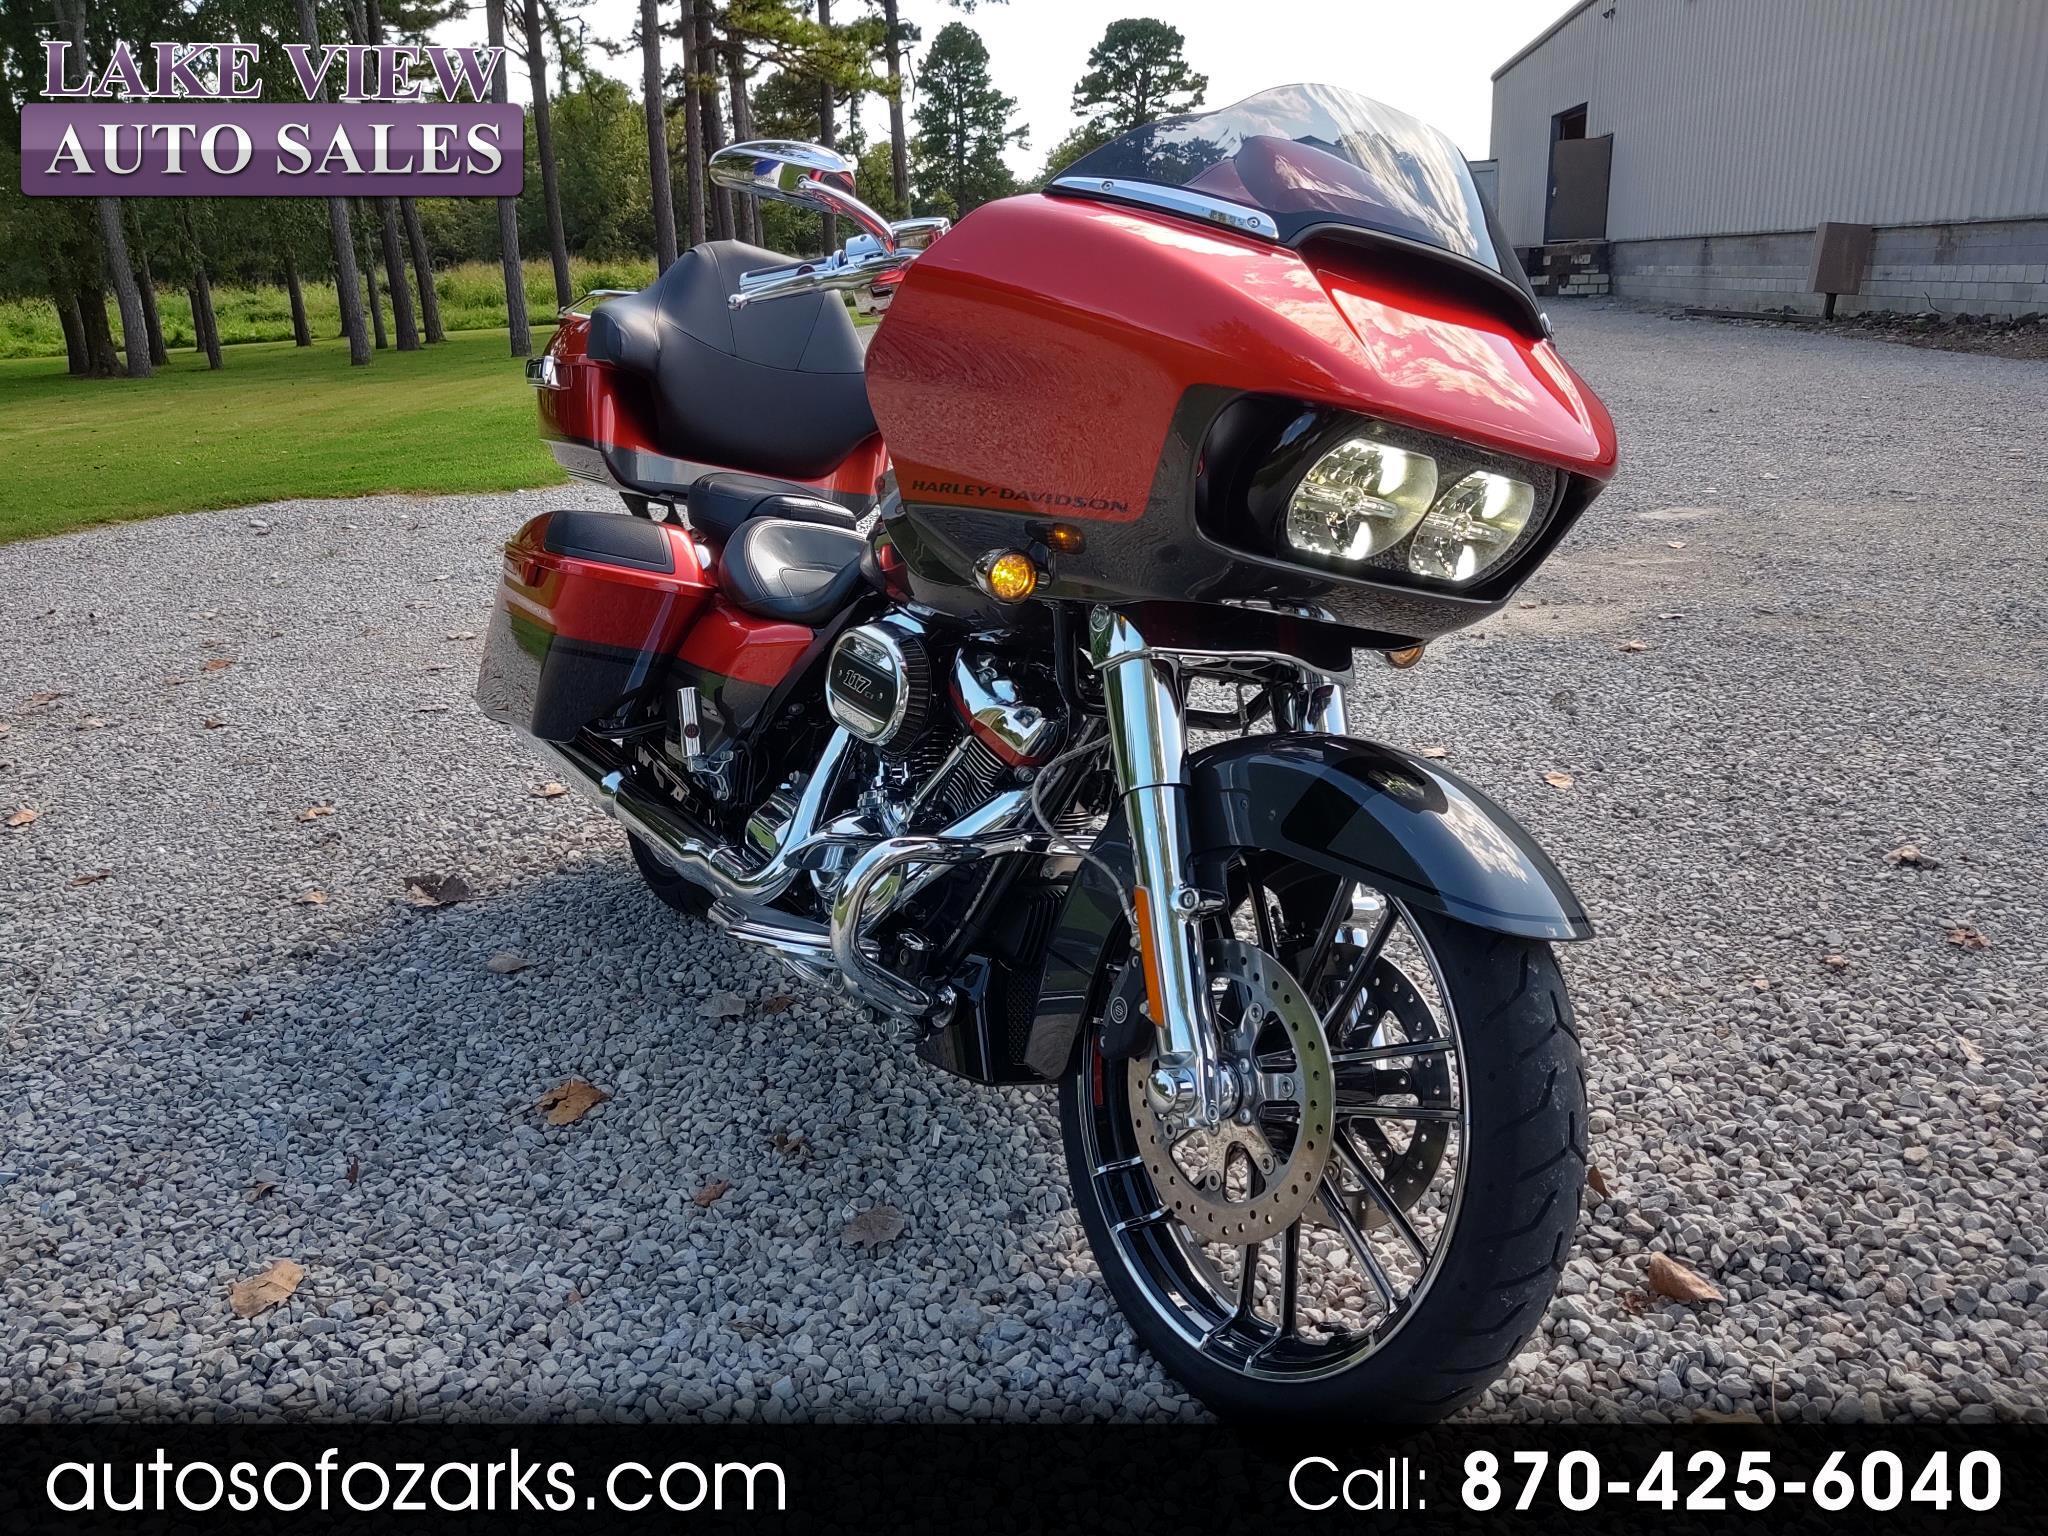 2018 Harley-Davidson CVO Road Glide SCREAMIN' EAGLE